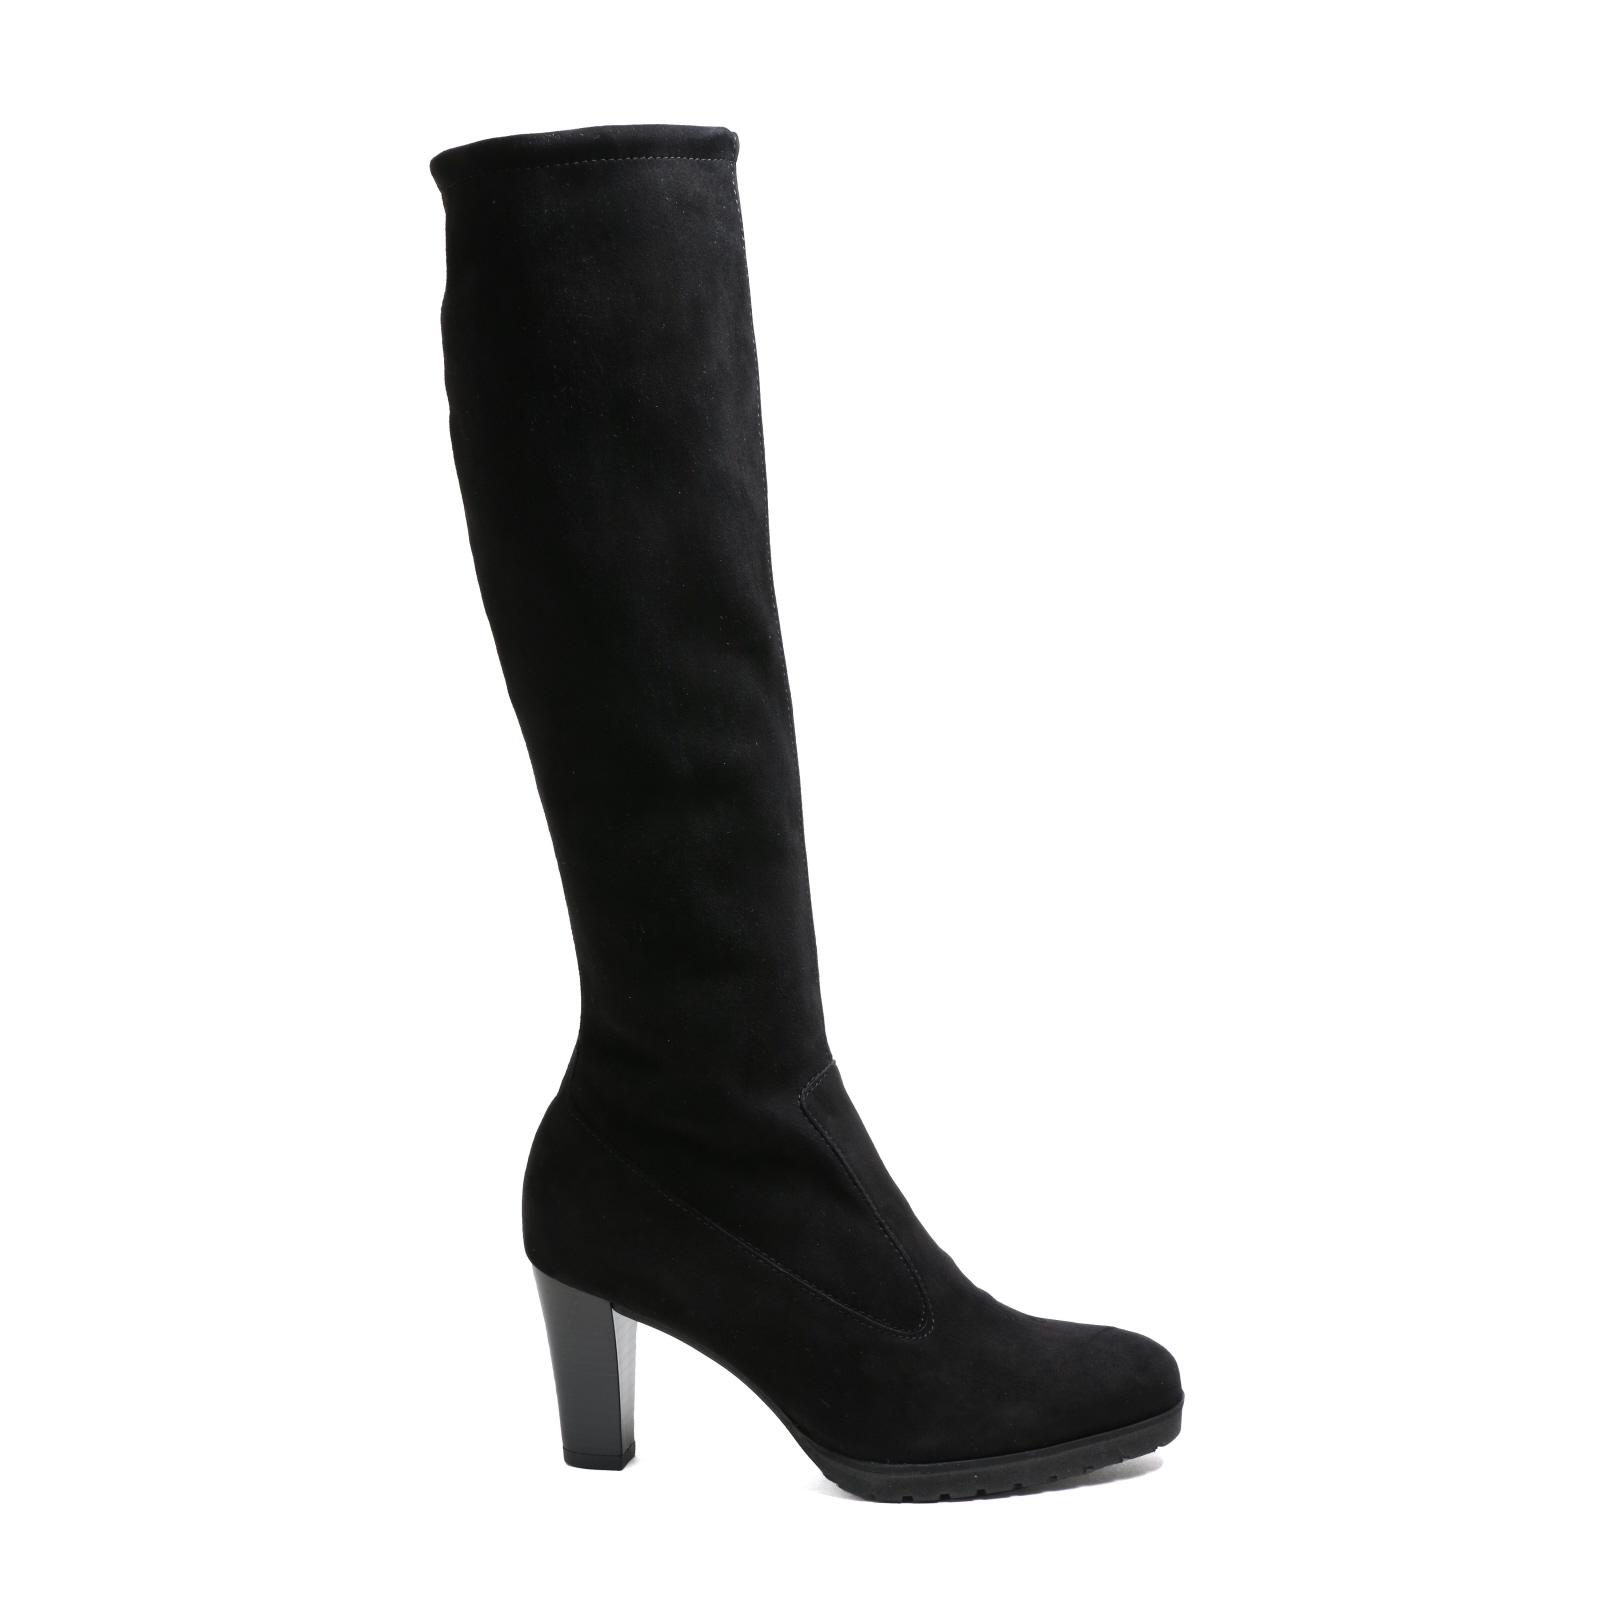 Damen Stiefel Peter Kaiser Lozana, Elegant schwarz  Velourleder NEU Gr.37